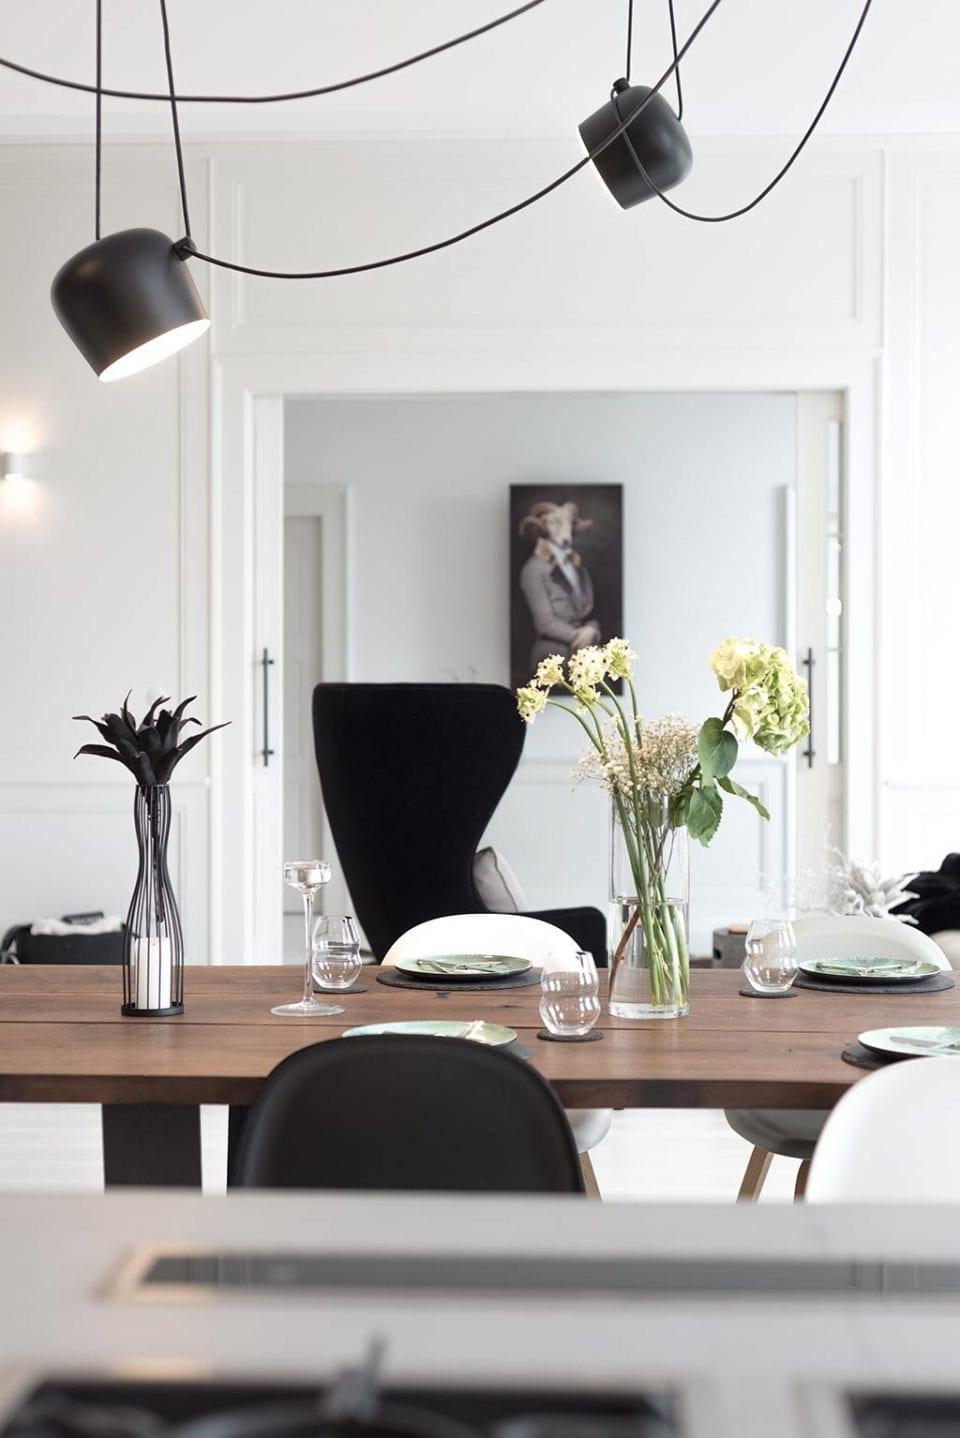 PN3 960x1438 - Look Inside: 1930s Czech Republic Apartment Re-invisioned